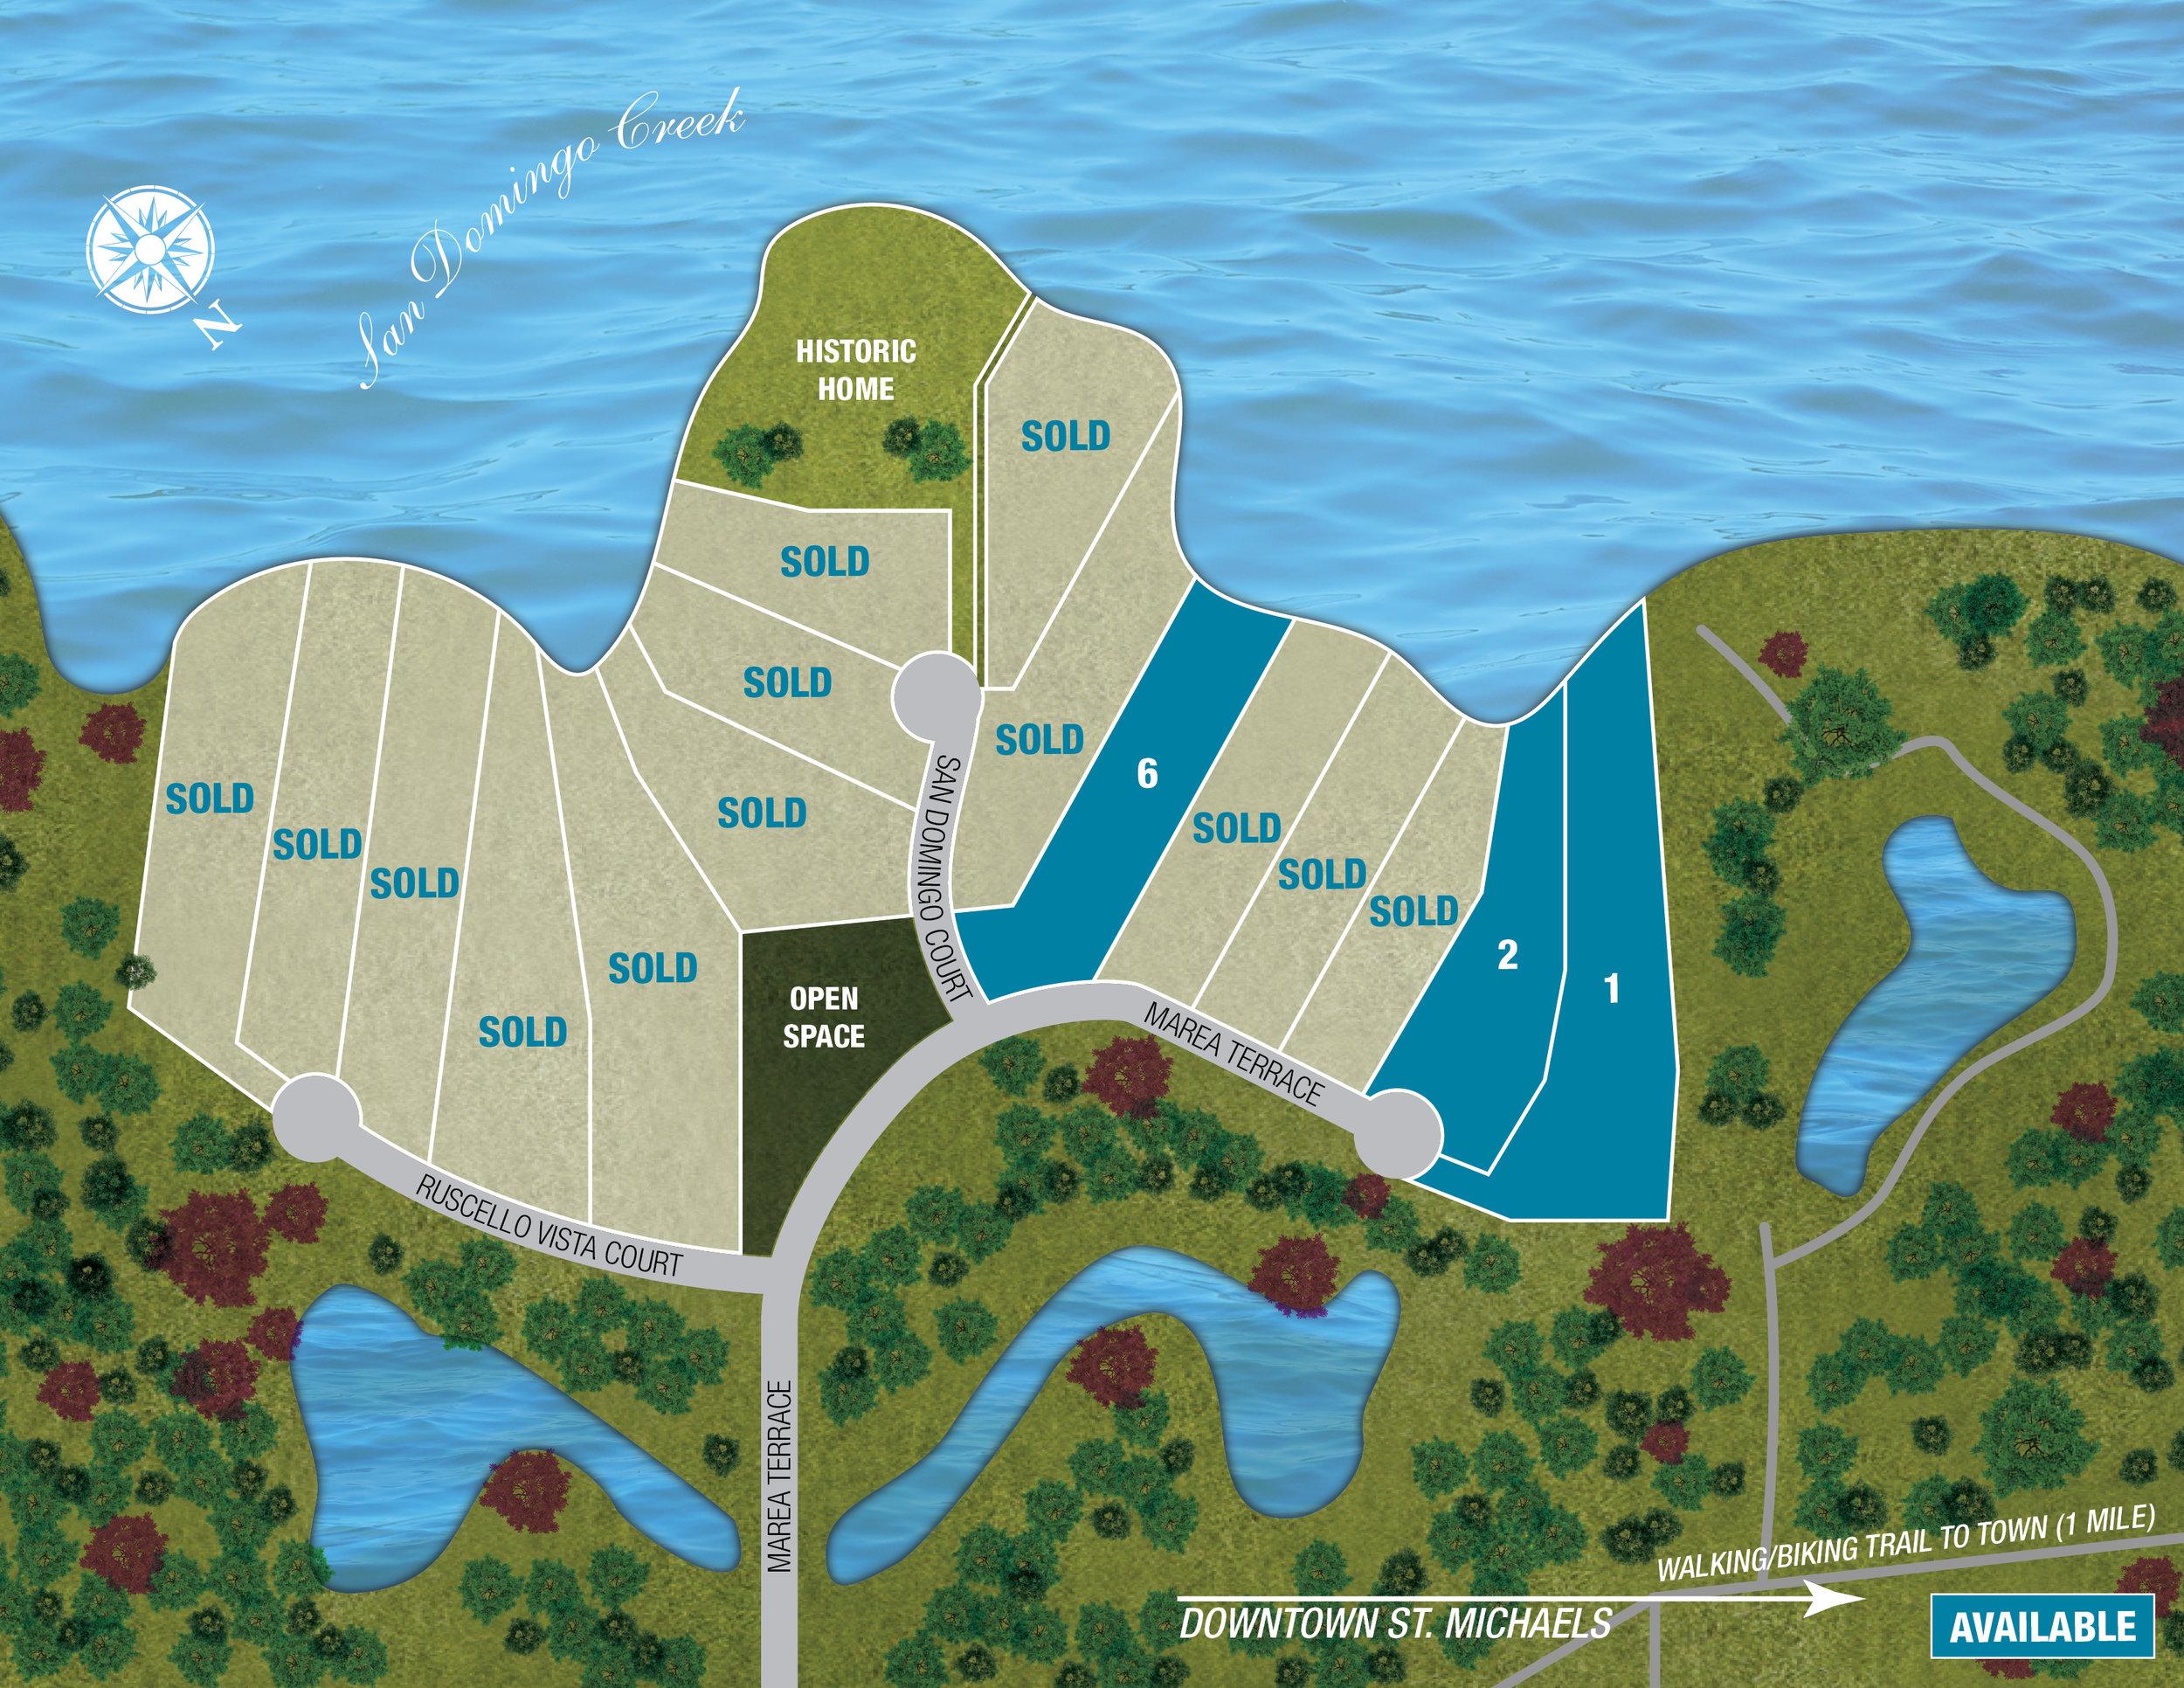 St. Michaels Properties Site Plan d15.jpg